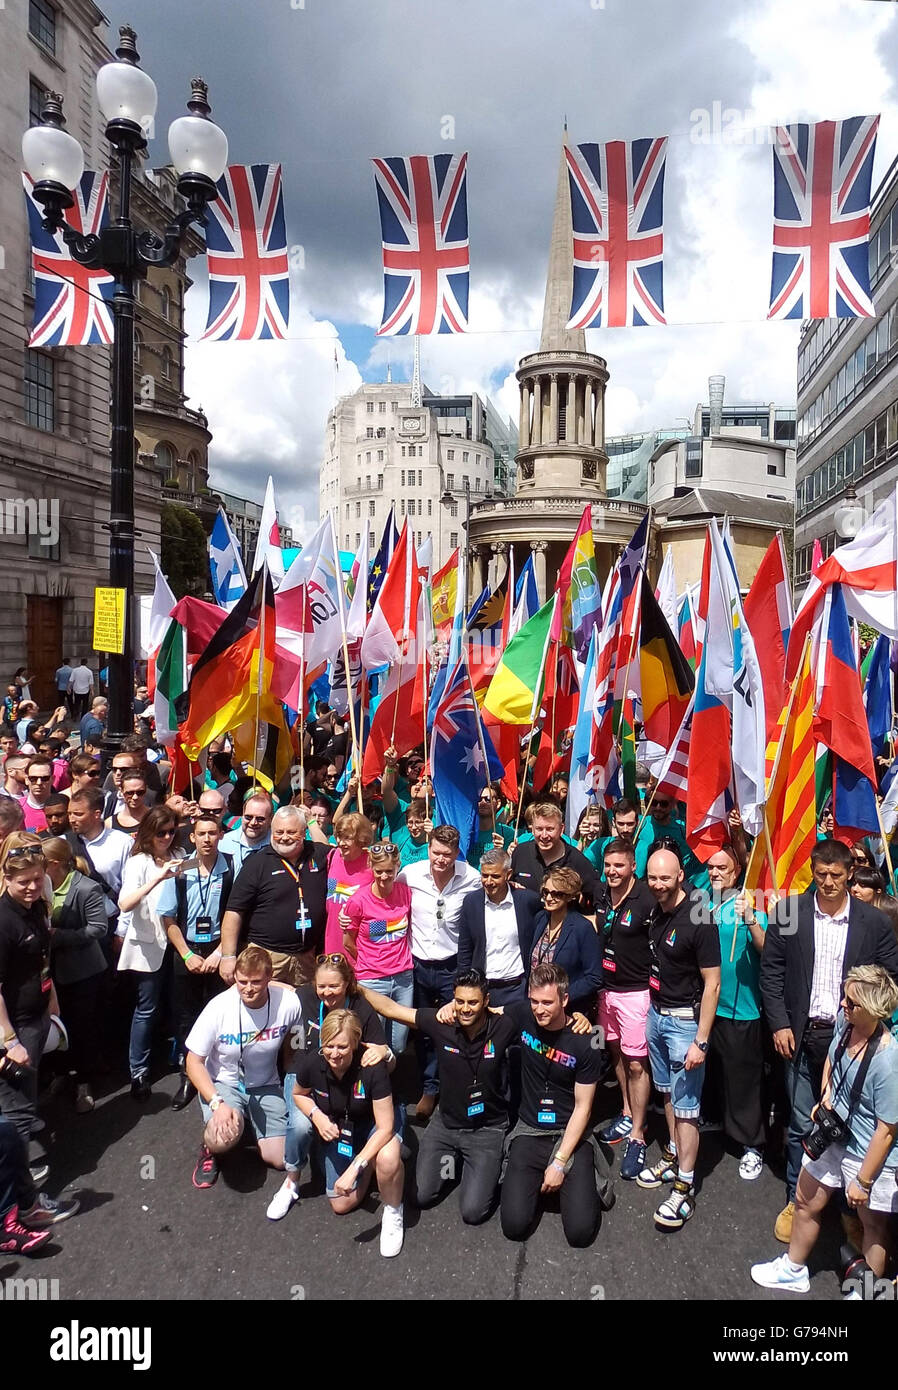 London, UK. 25th June 2016. Sadiq Khan, mayor of London, and Matthew Barzun leading the Parade at the Pride London - Stock Image